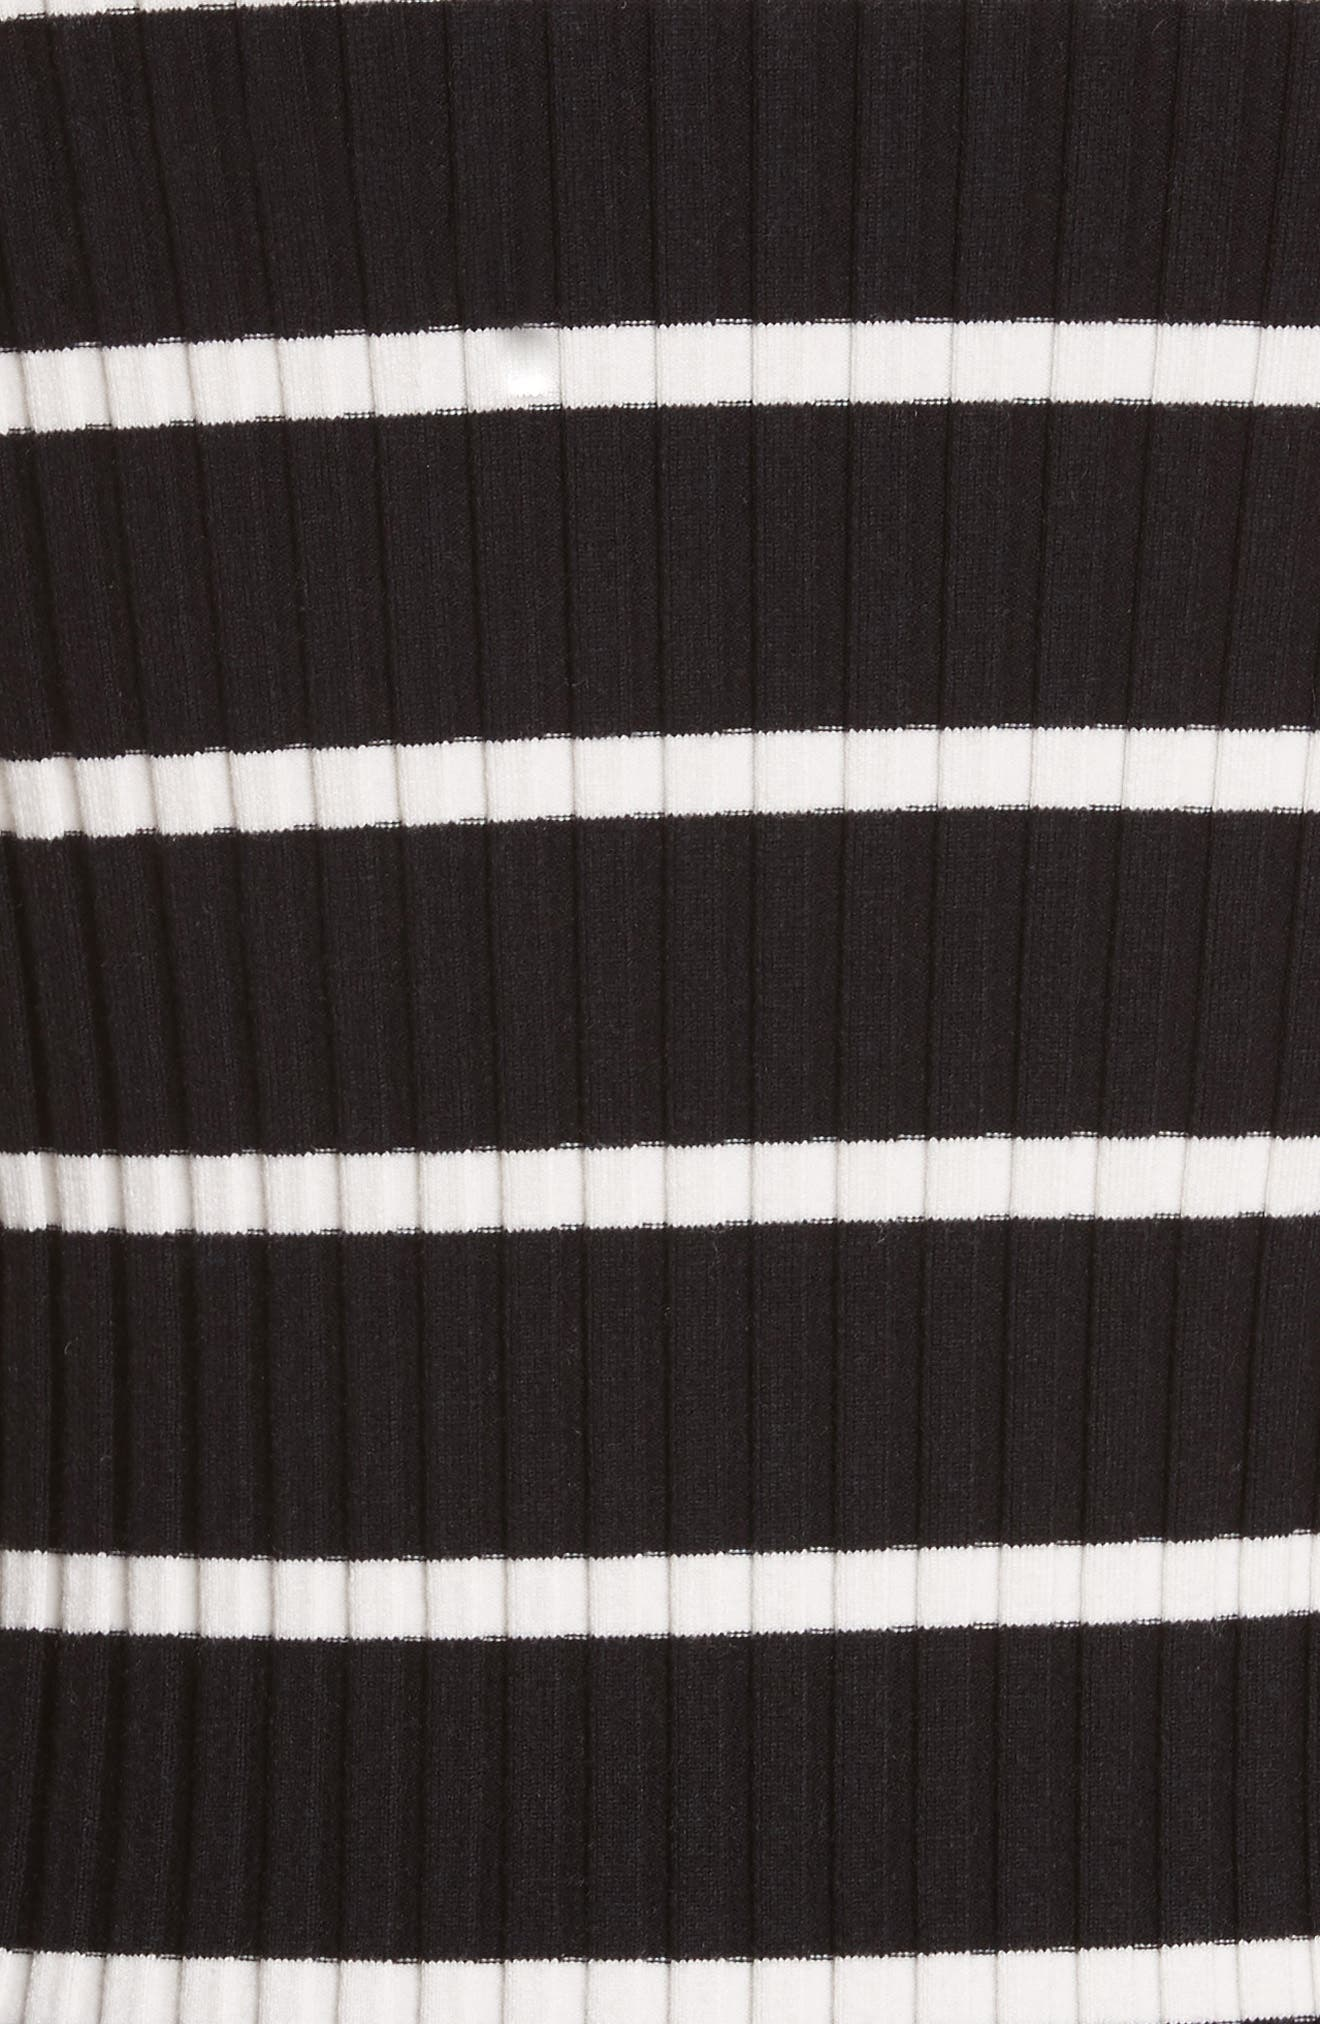 Stripe Knit Turtleneck Dress,                             Alternate thumbnail 5, color,                             Black With Ivory Stripe